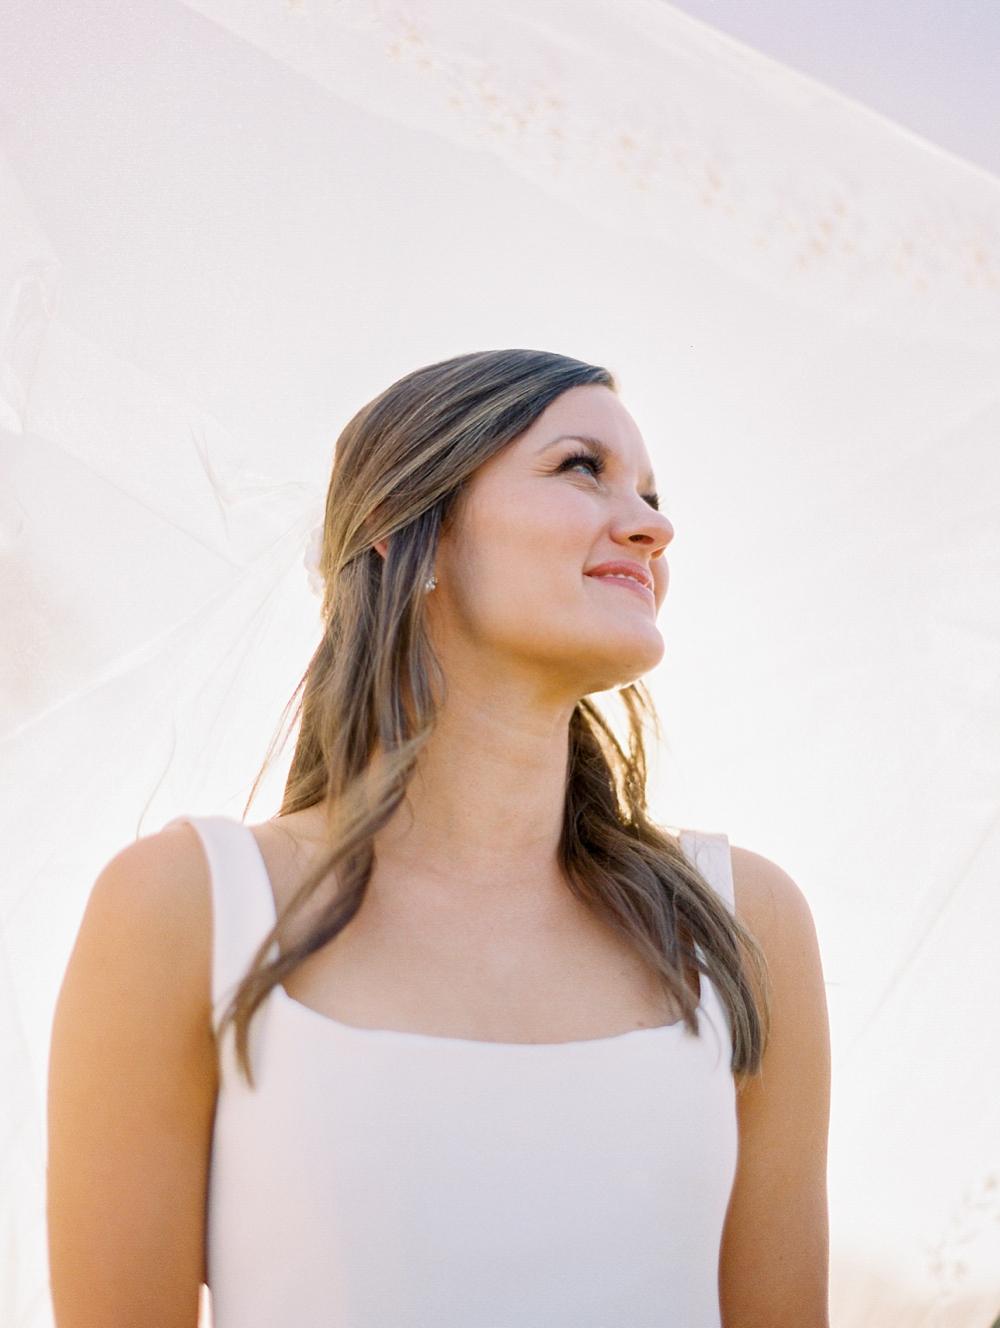 Kristin-La-Voie-Photography-austin-houston-texas-wedding-photographer-the-oaks-at-high-hill -24